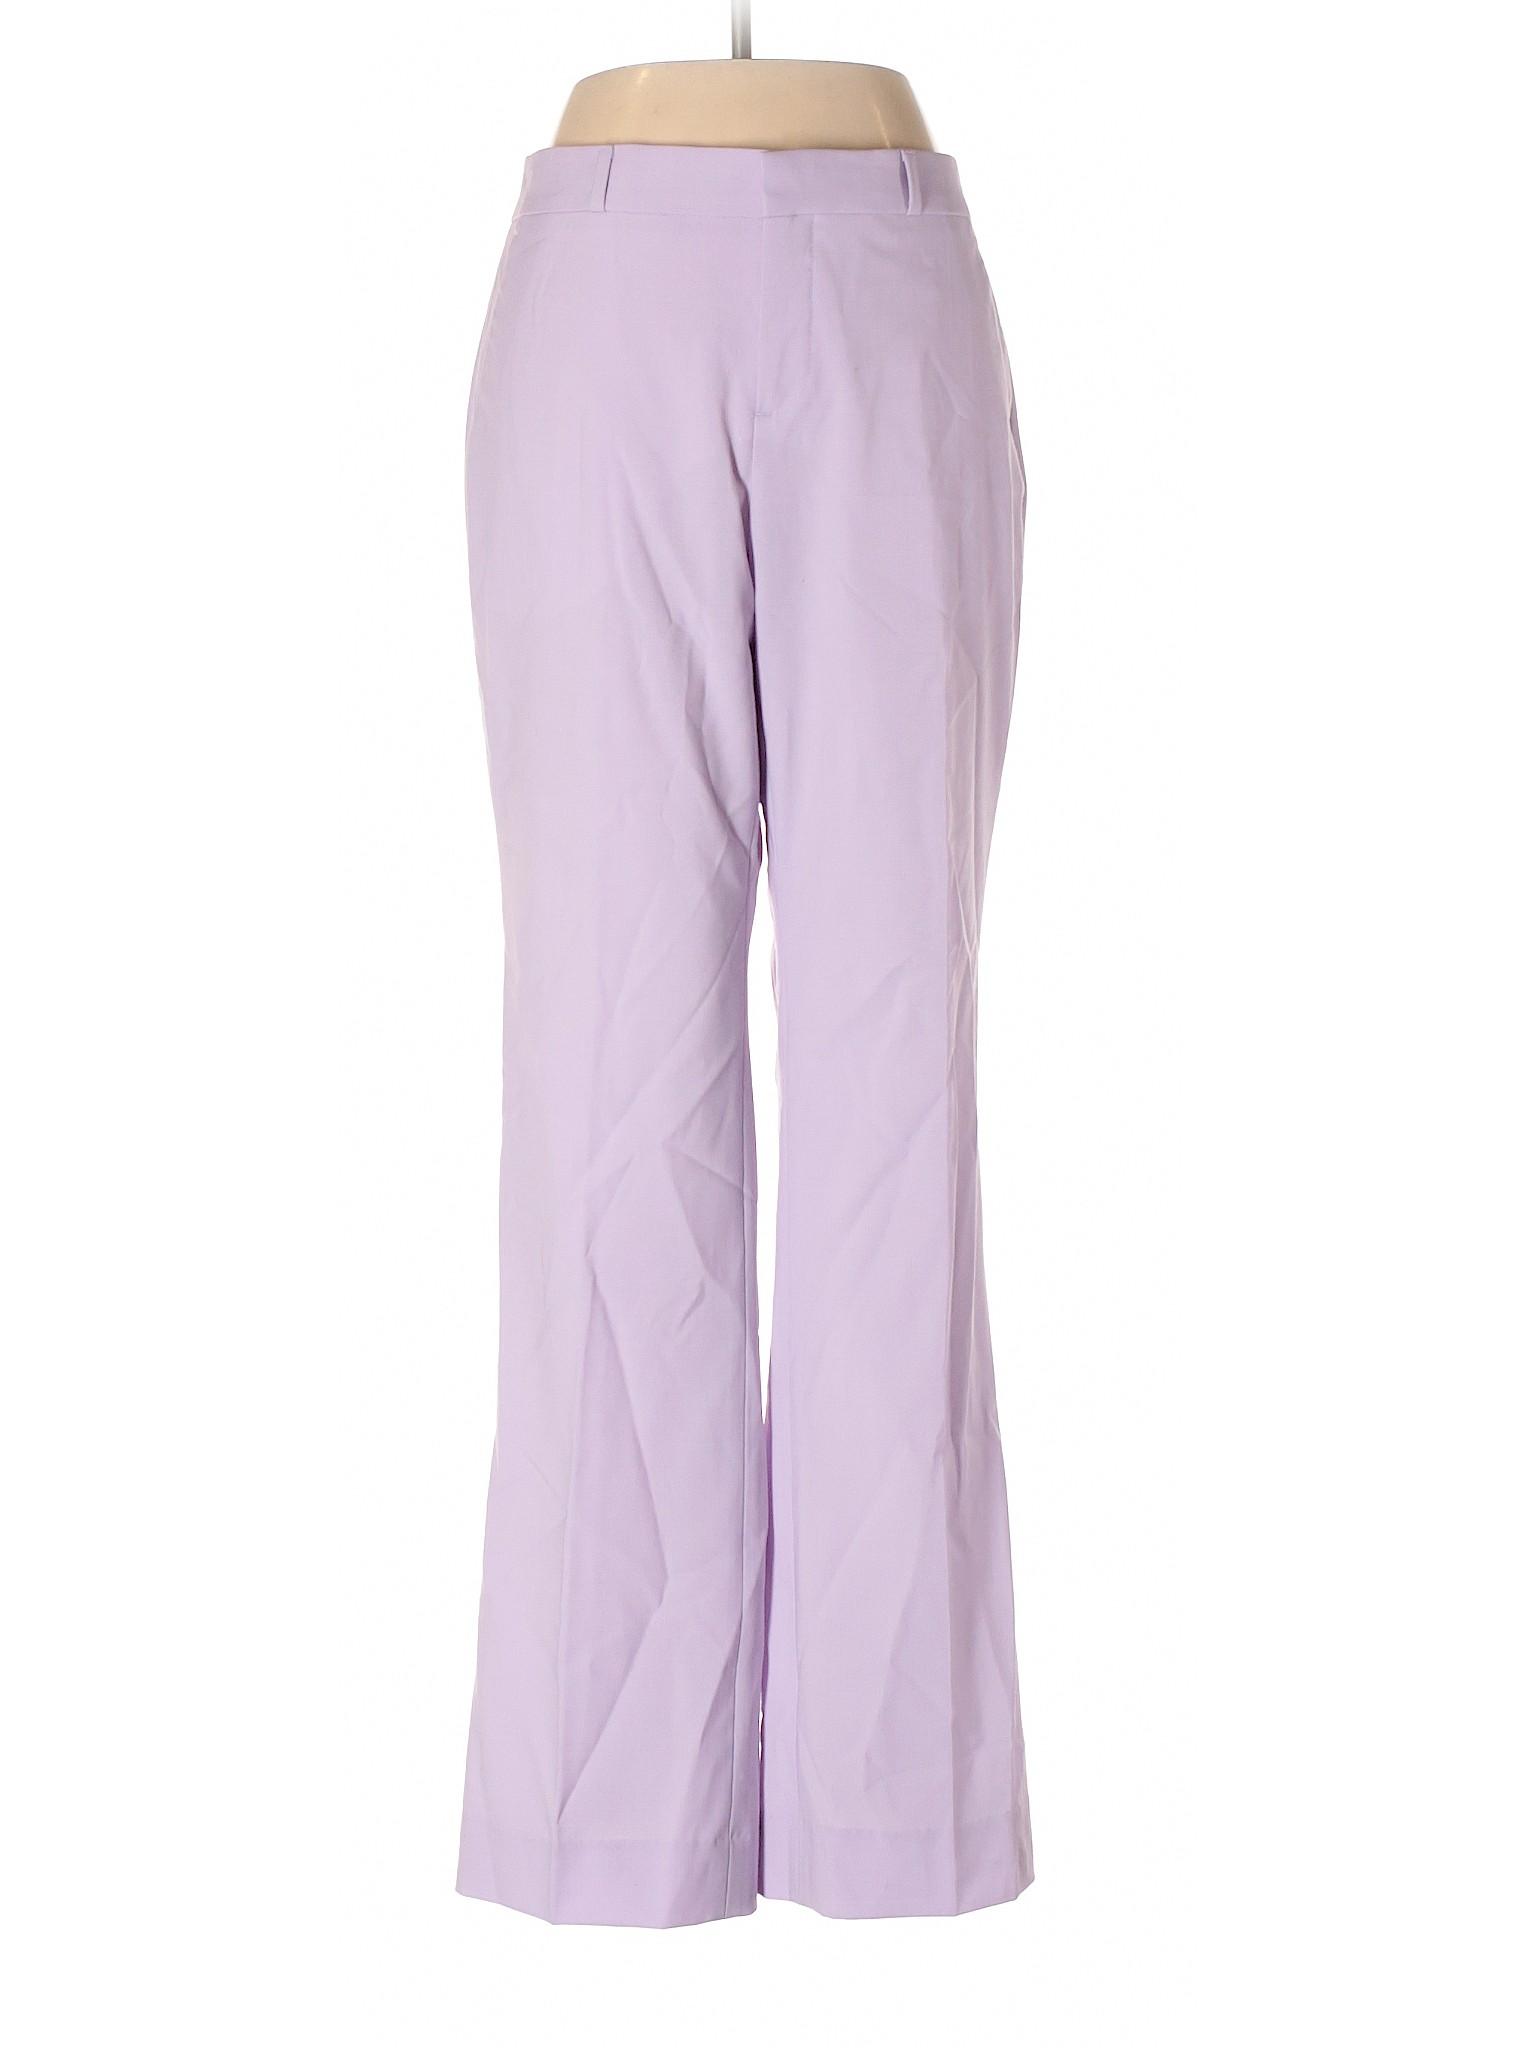 Leisure Republic Dress Banana Pants winter Bwqr1B